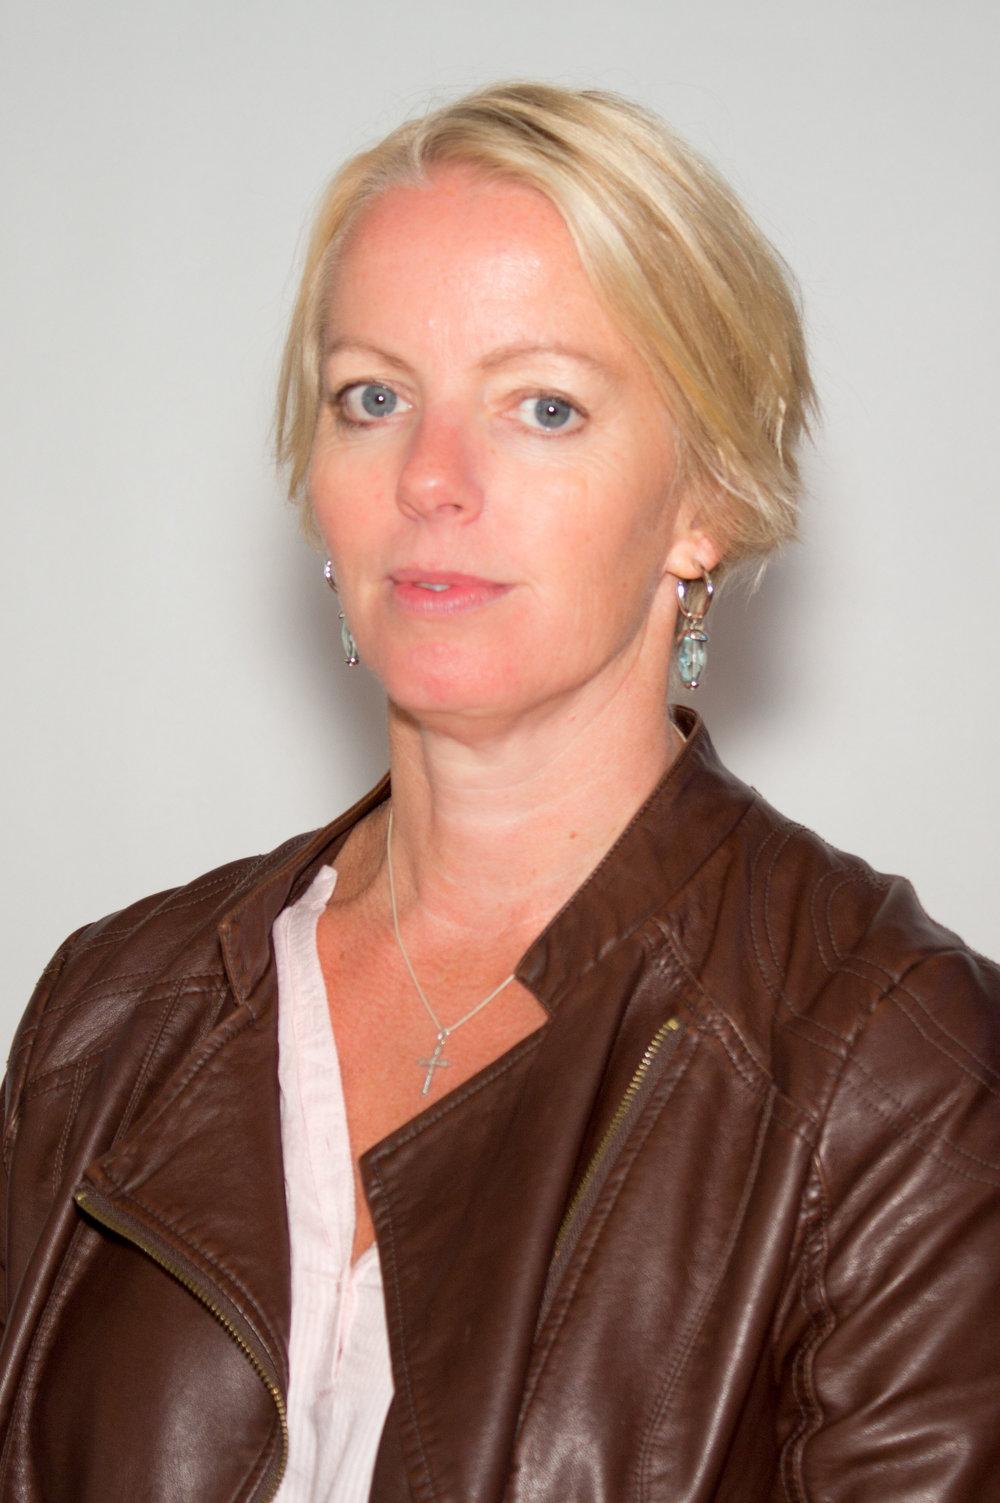 Ingeborg Katarina Vea